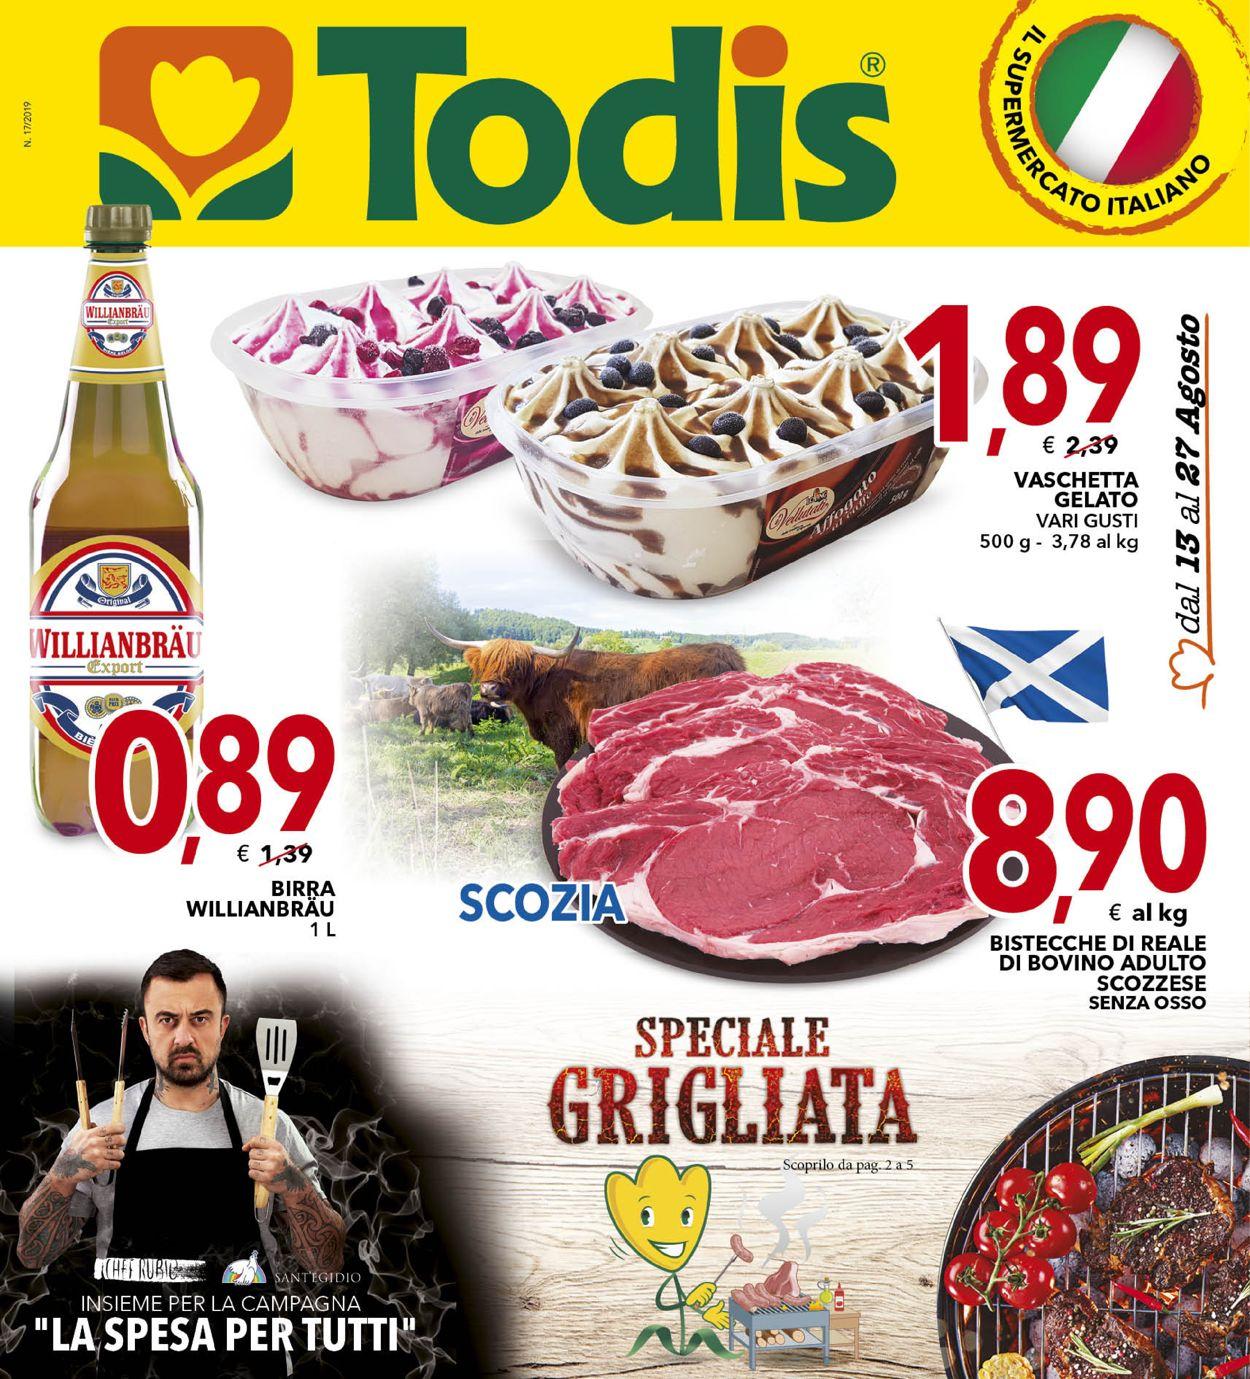 Volantino Todis - Offerte 13/08-27/08/2019